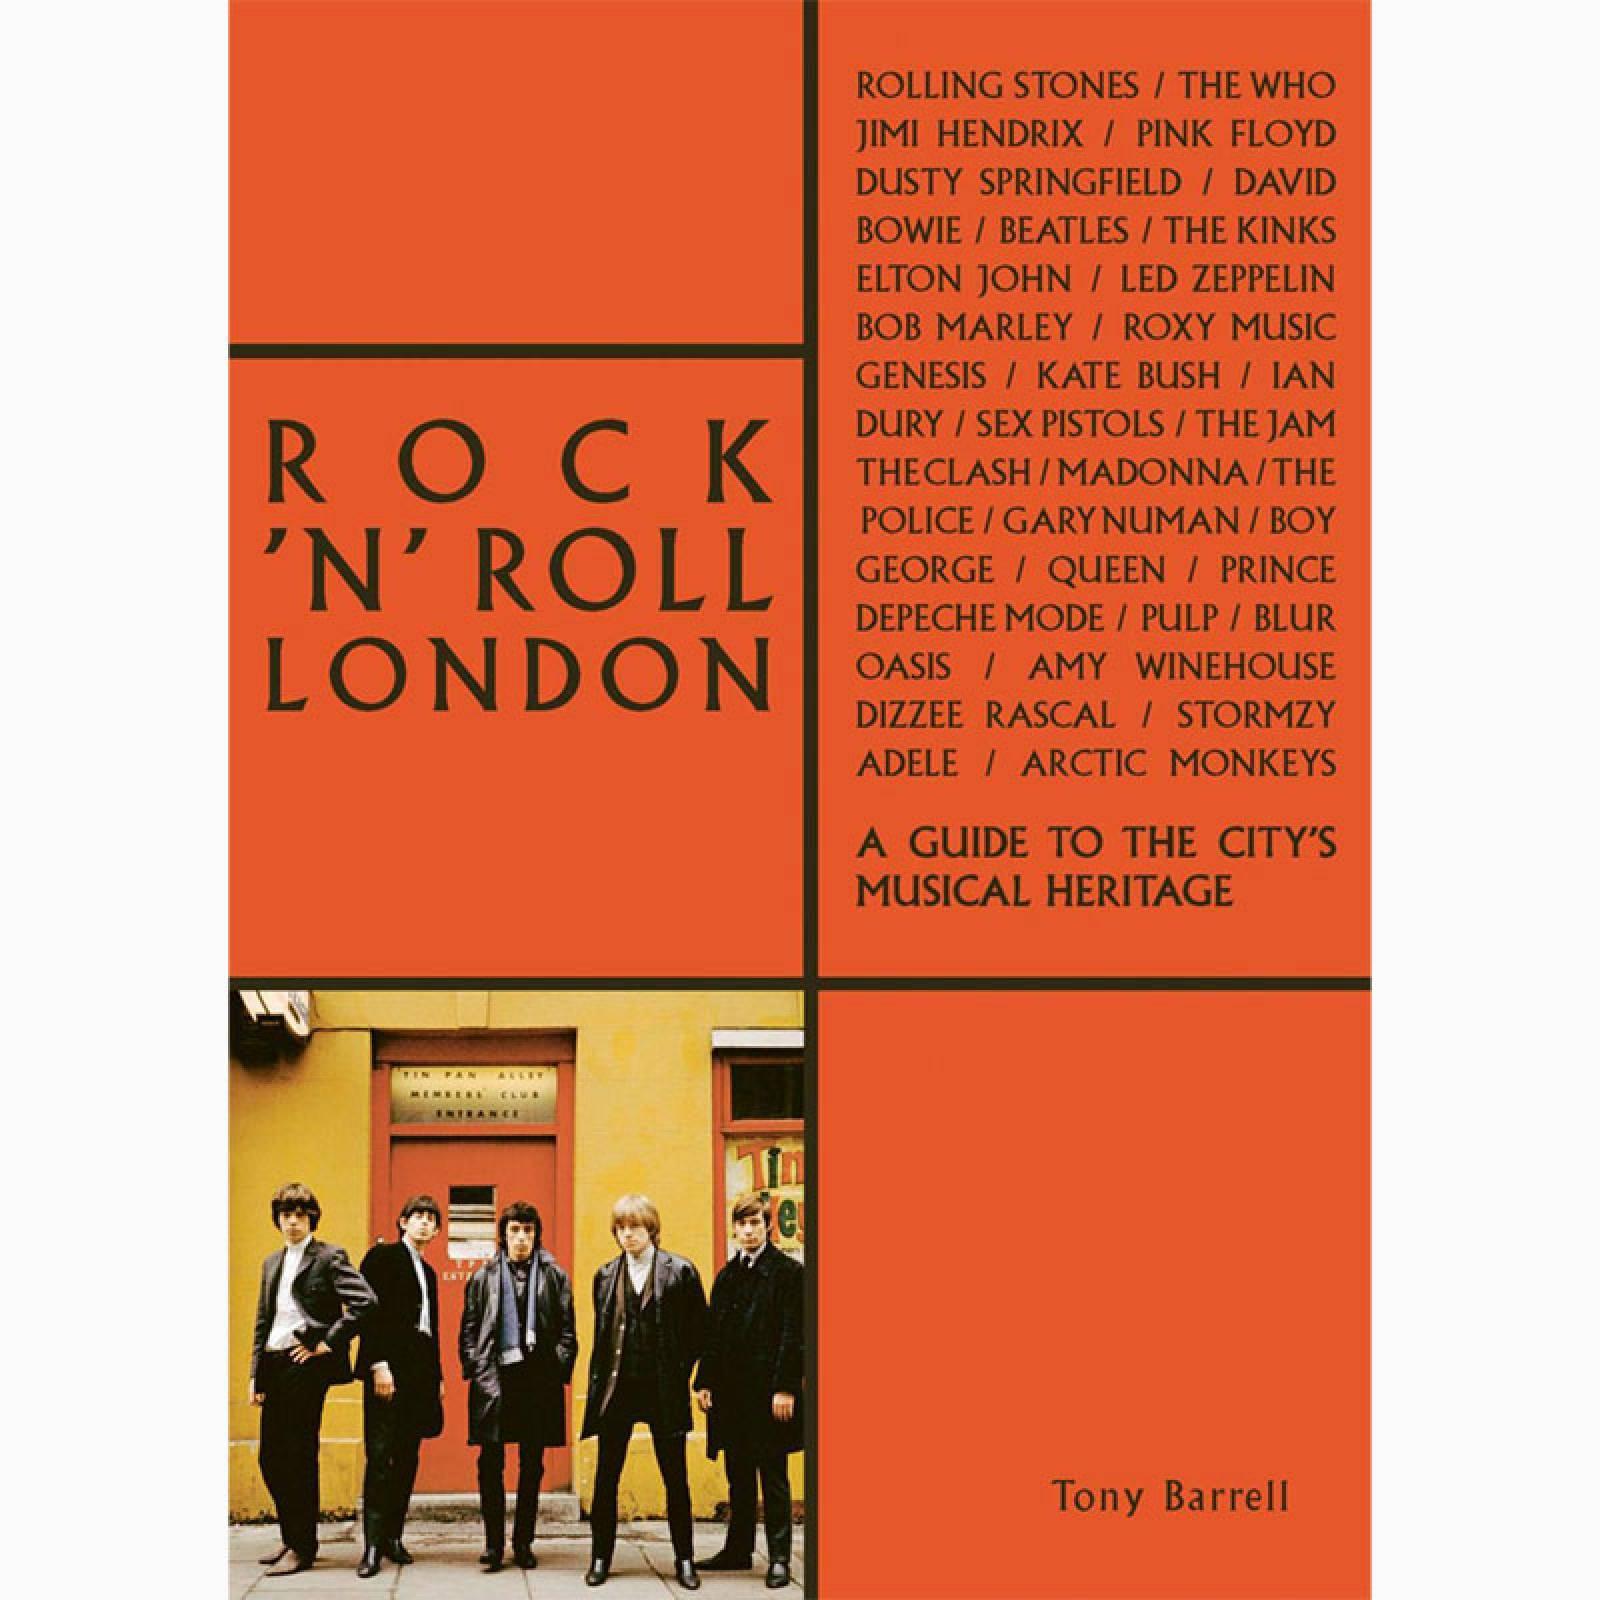 Rock 'n' Roll London - Paperback Book